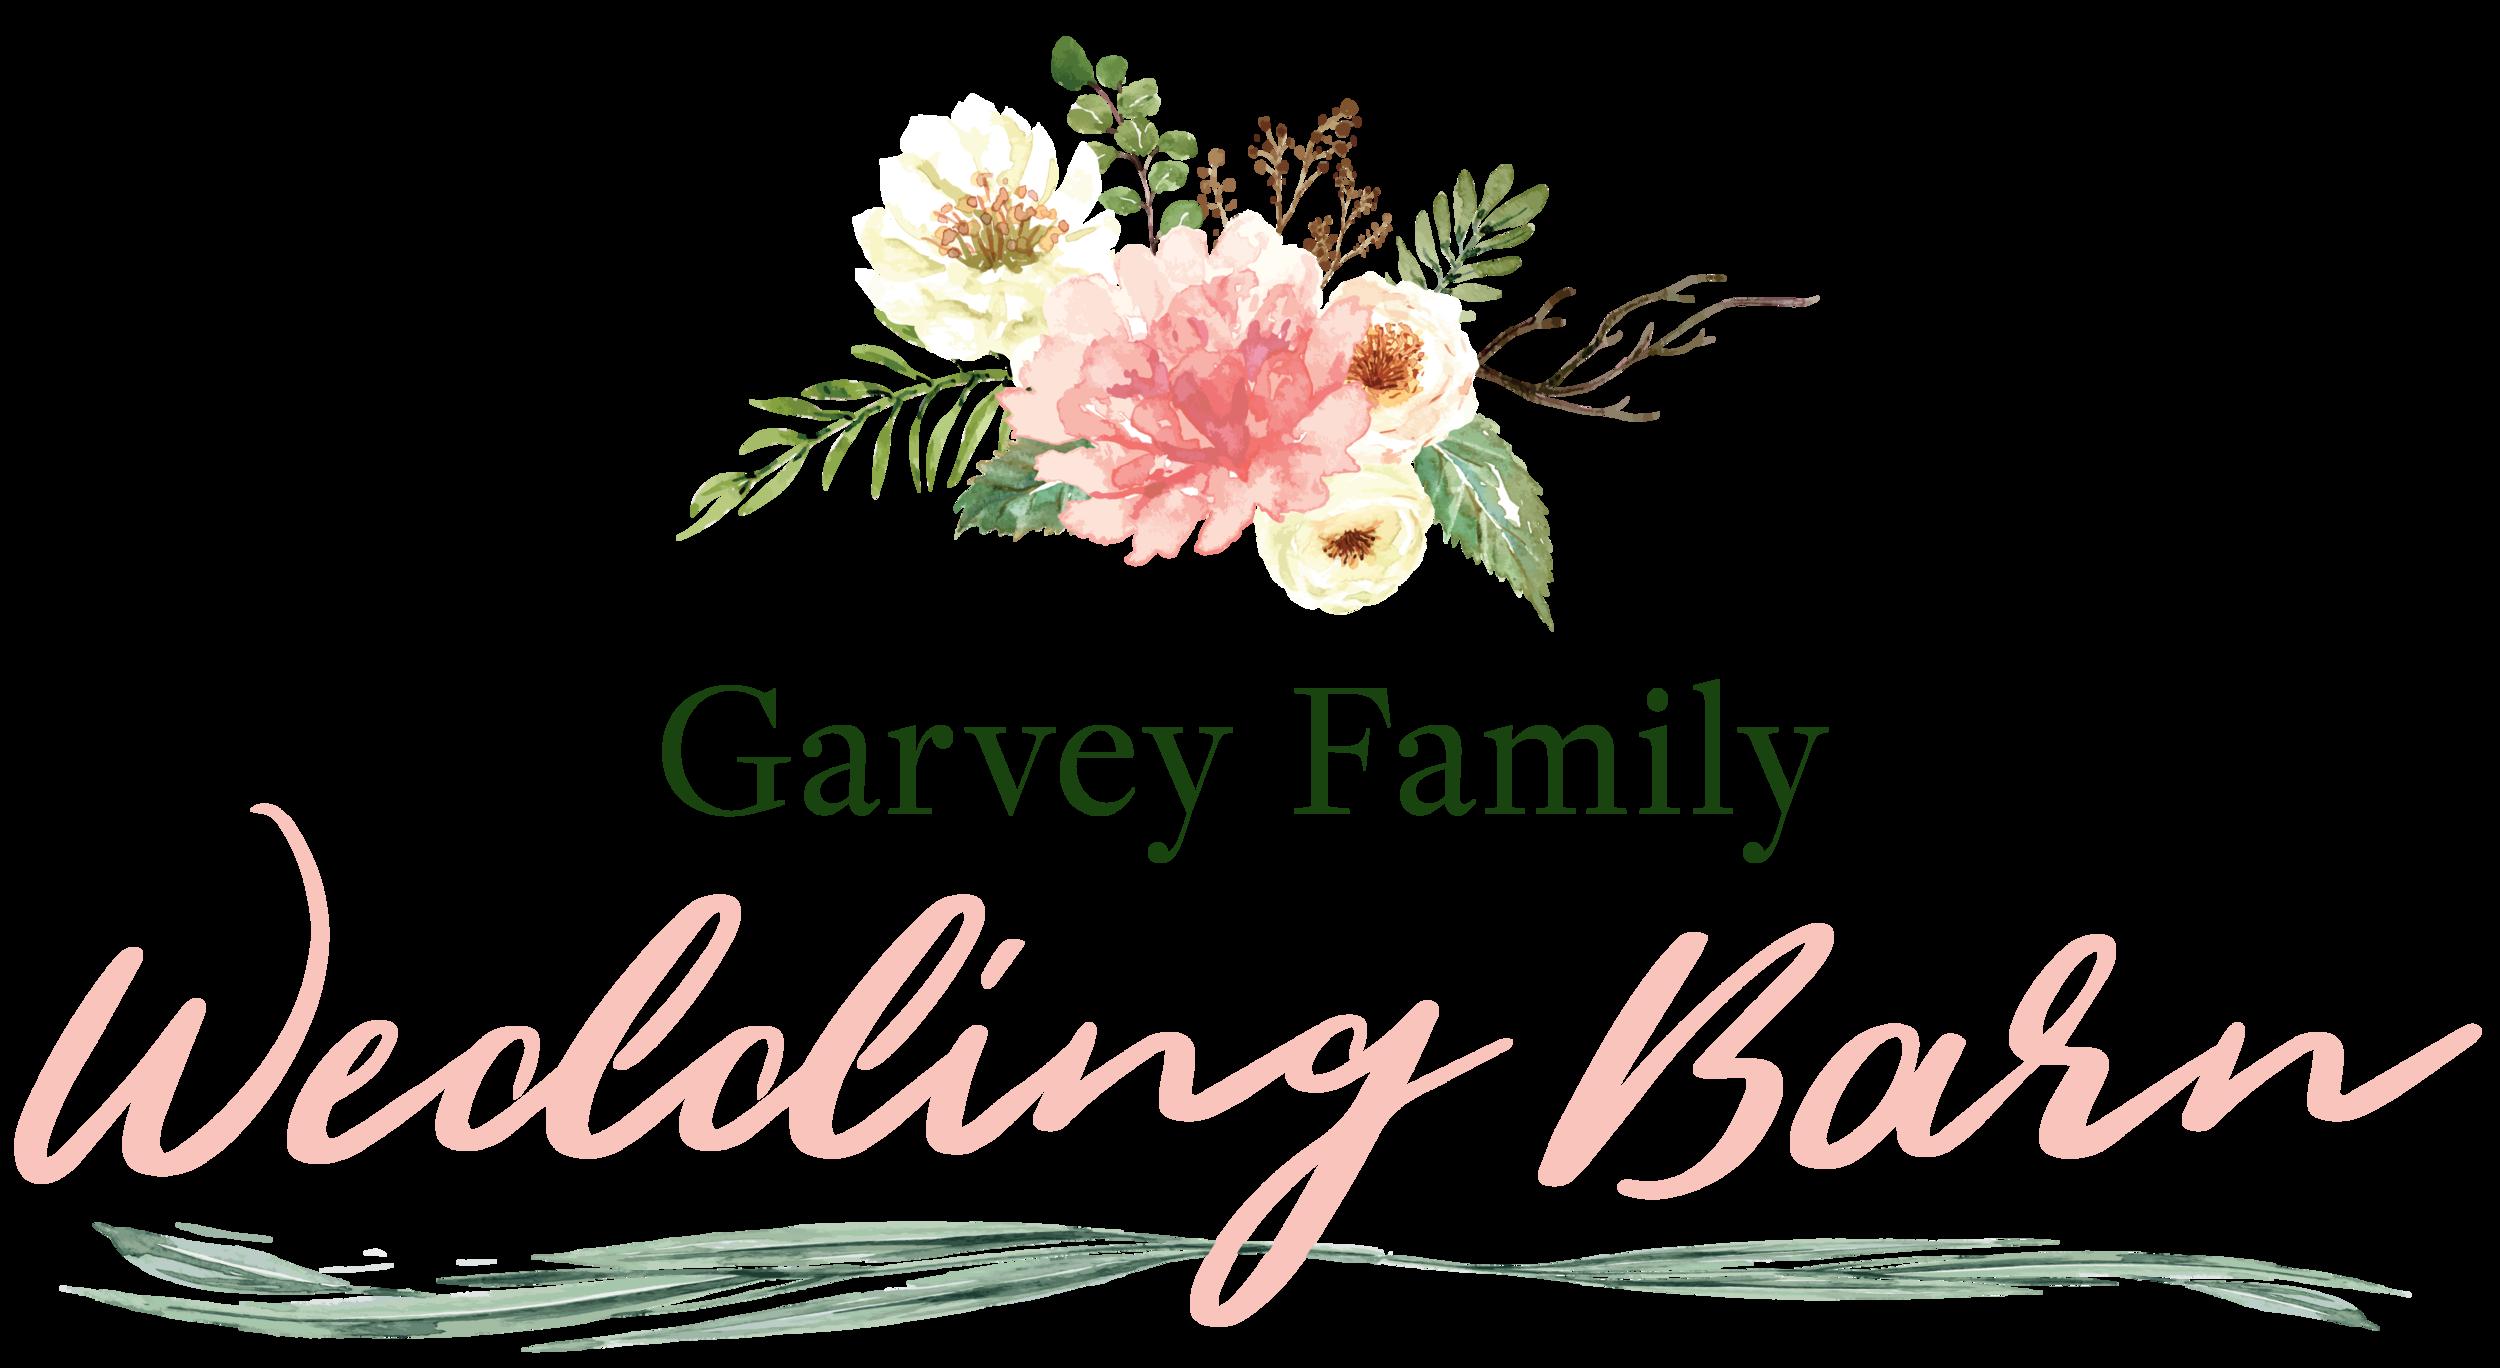 garvey-family-wedding-barn.png